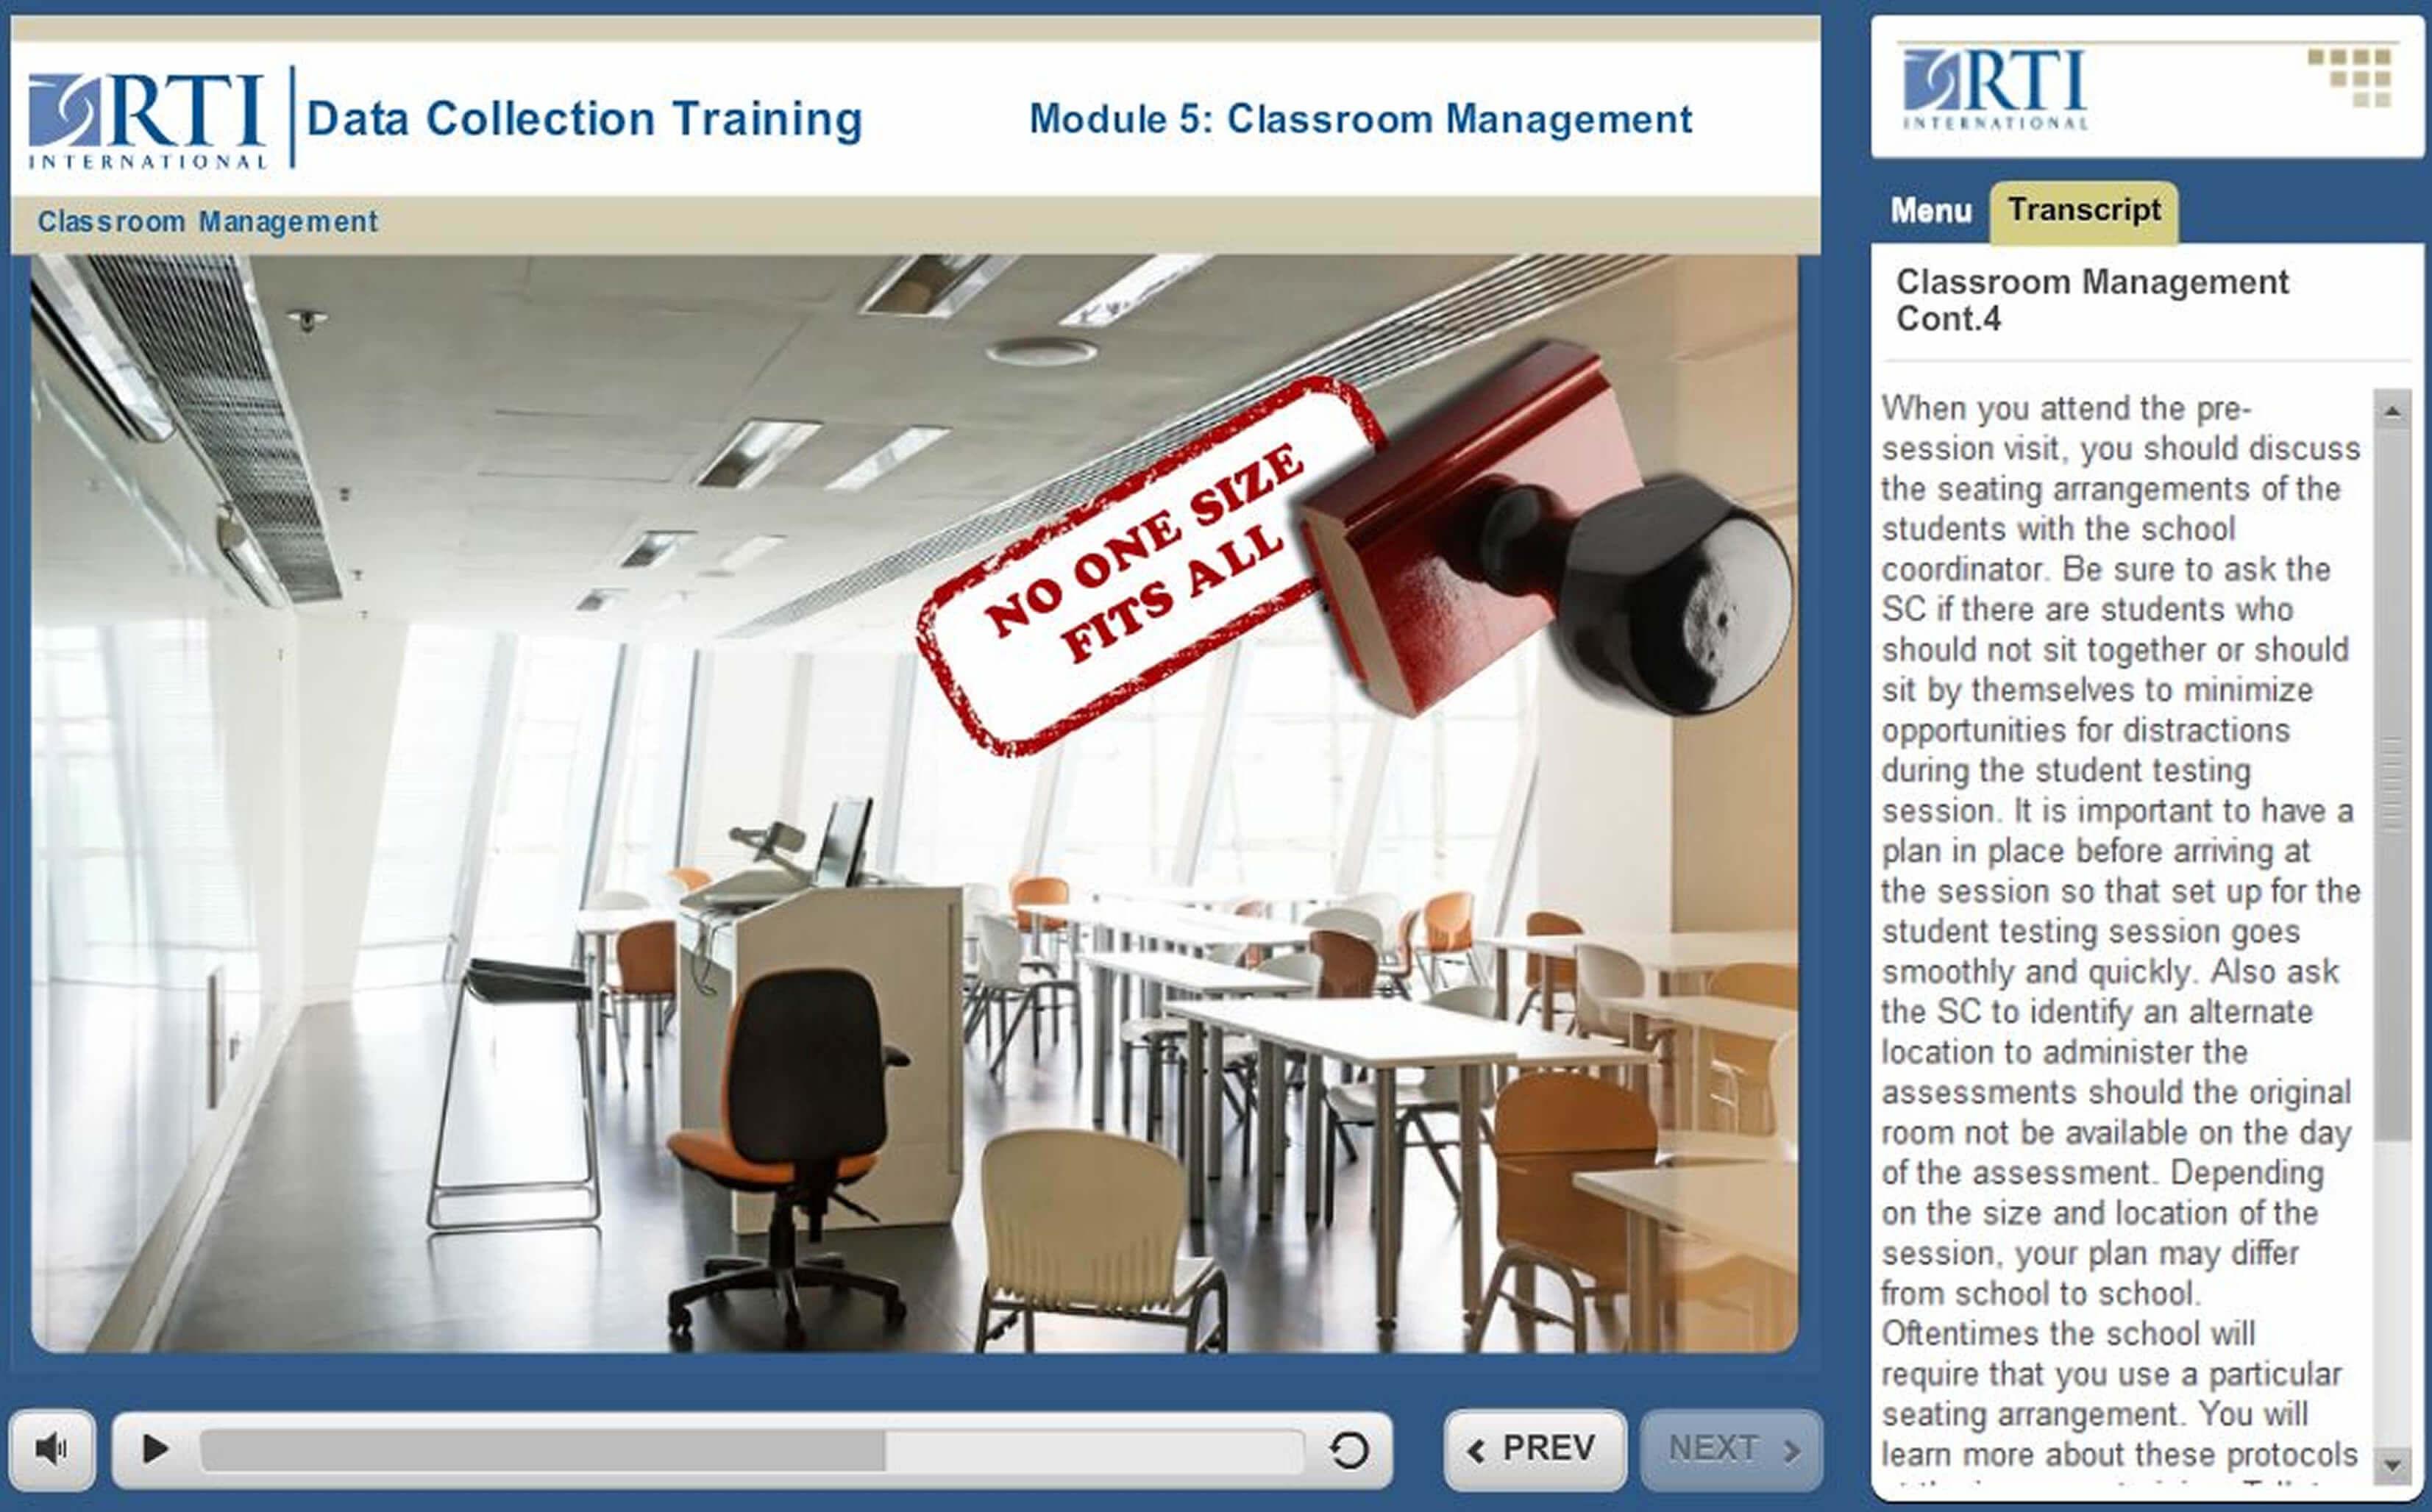 RTI Online Training Modules